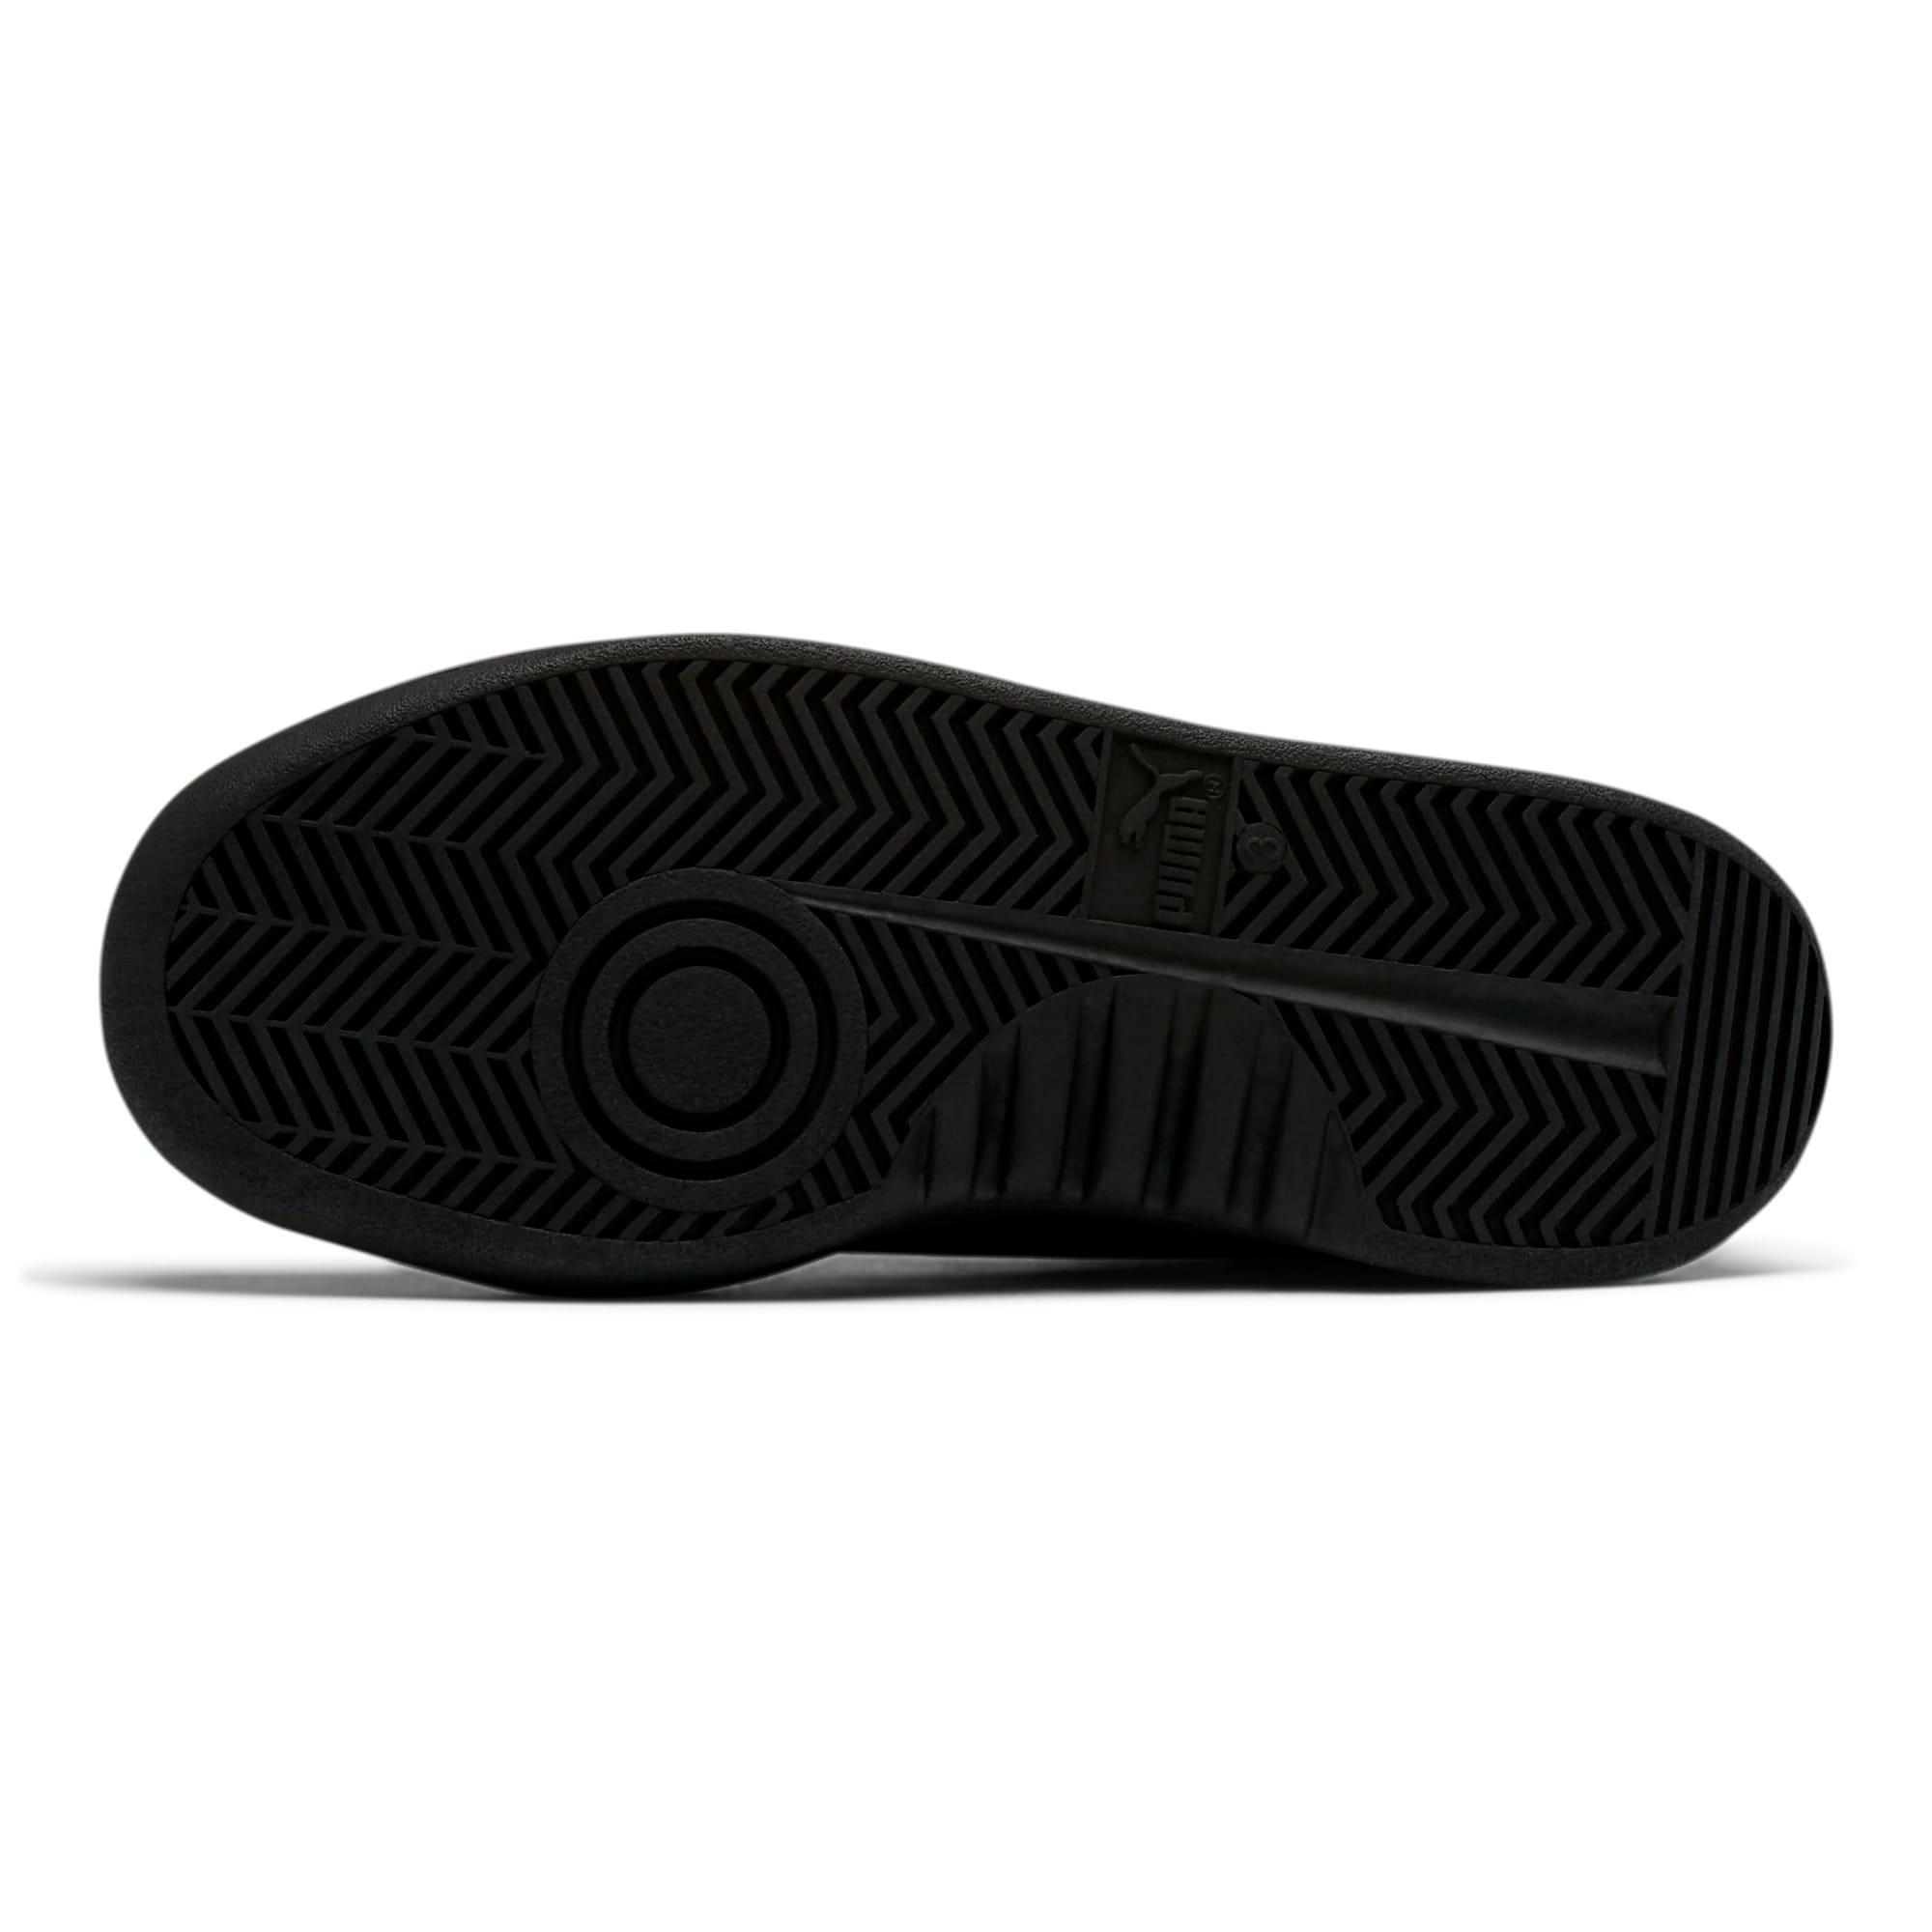 Thumbnail 3 of GV Special Sneakers JR, Puma Black-Puma Team Gold, medium